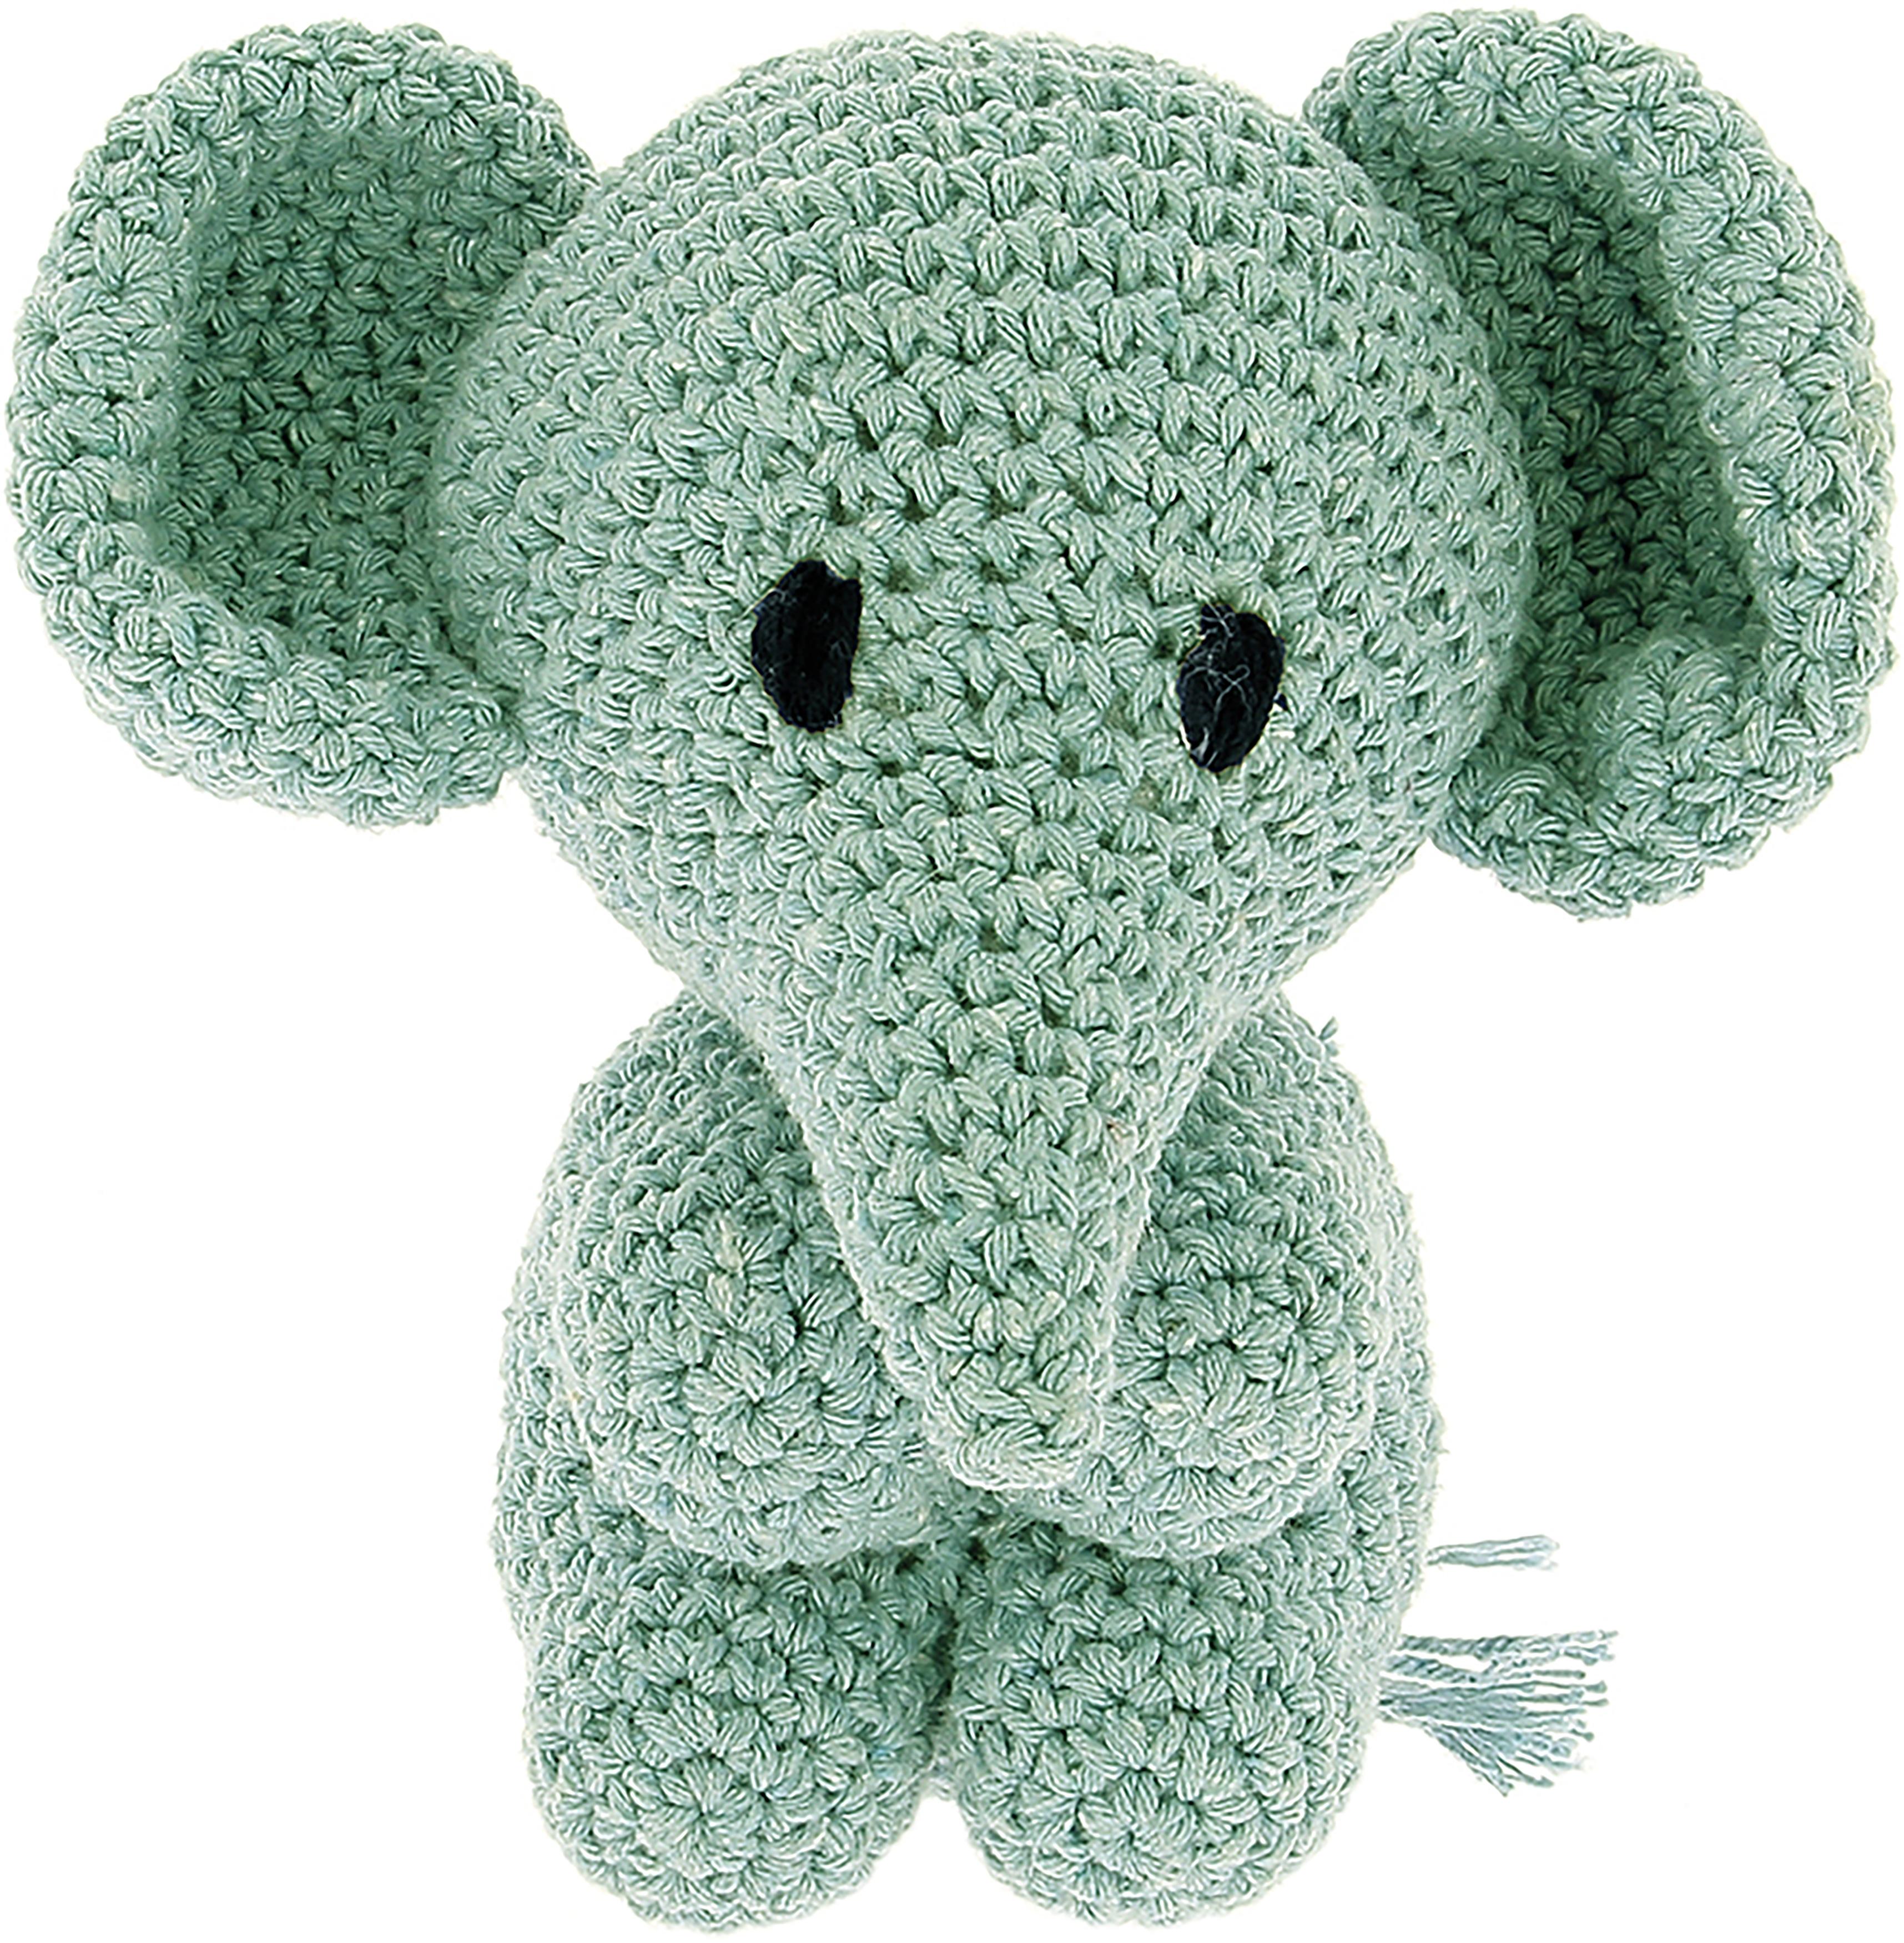 Hoooked Elephant Mo Yarn Kit W/Eco Barbante Yarn